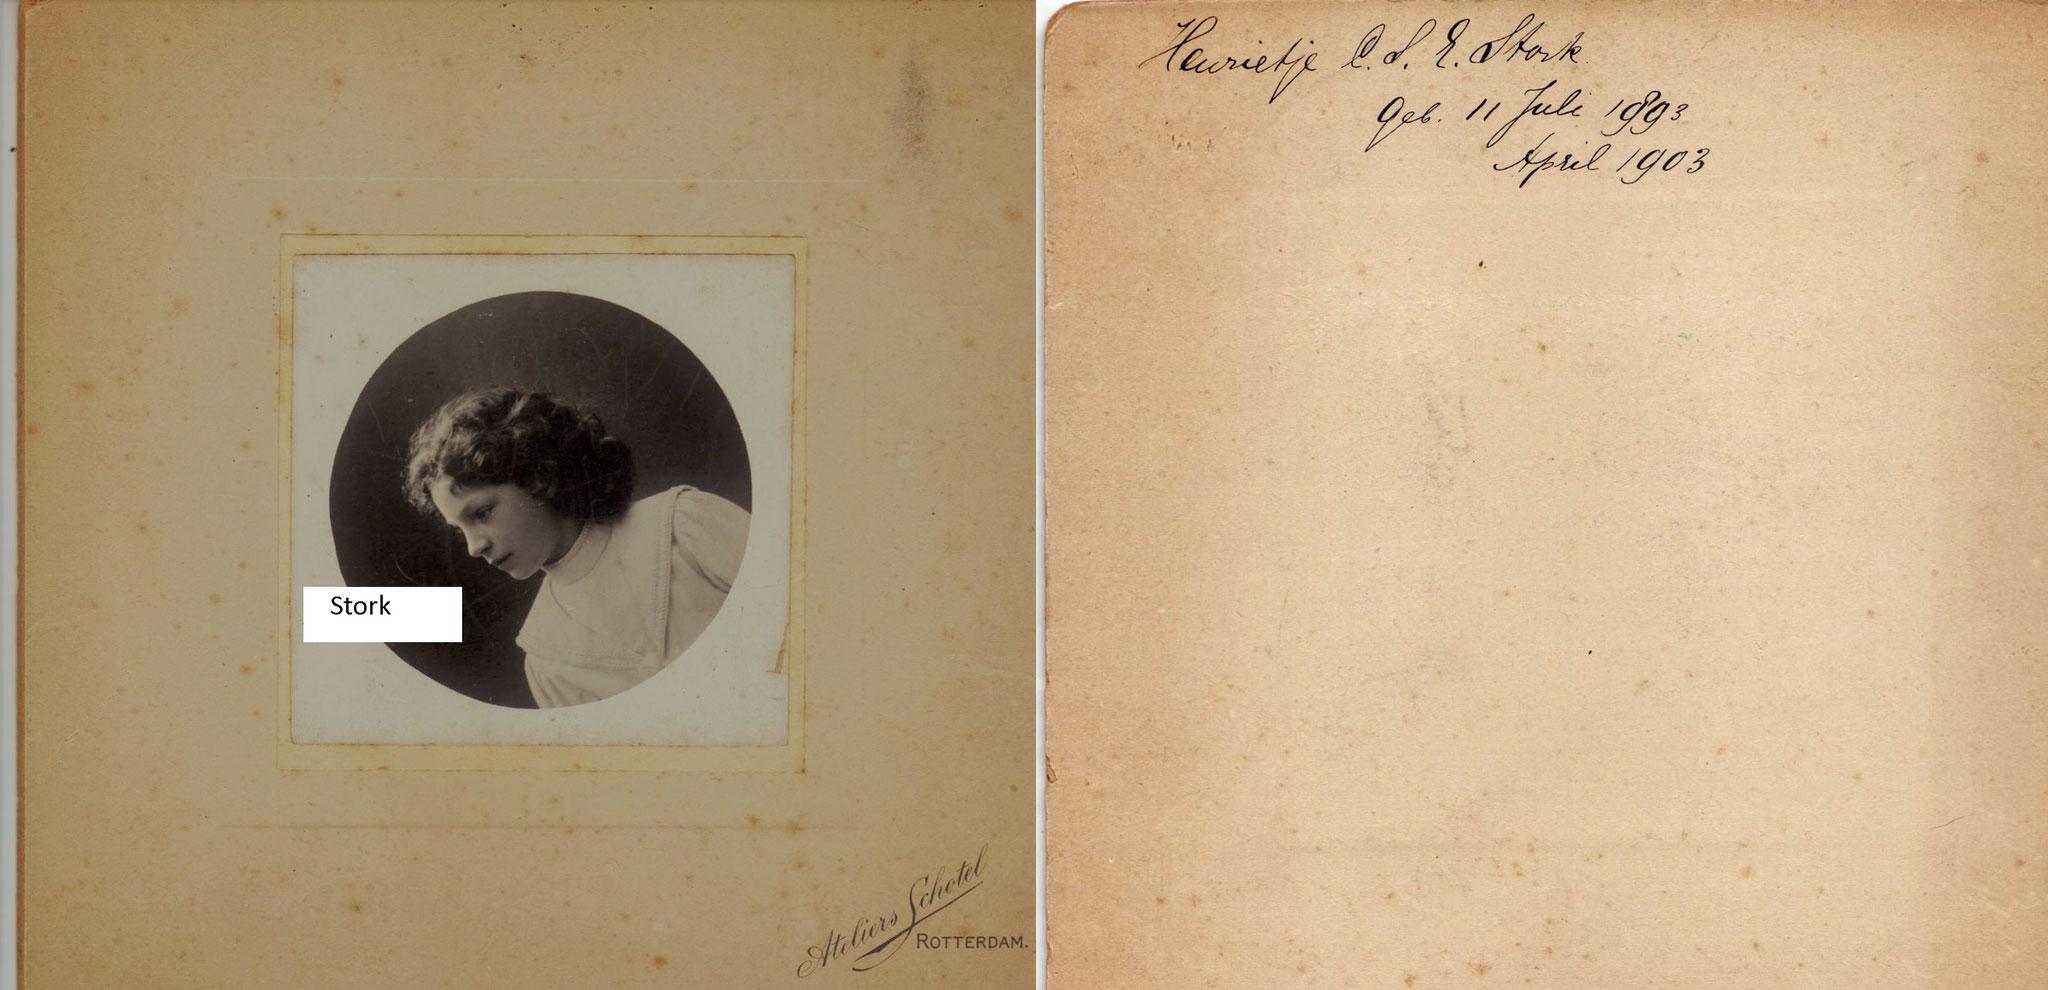 Stork, Henriette Cornelie Sara Elisabeth Geb. 11-7-1893 Hengelo € 3,00